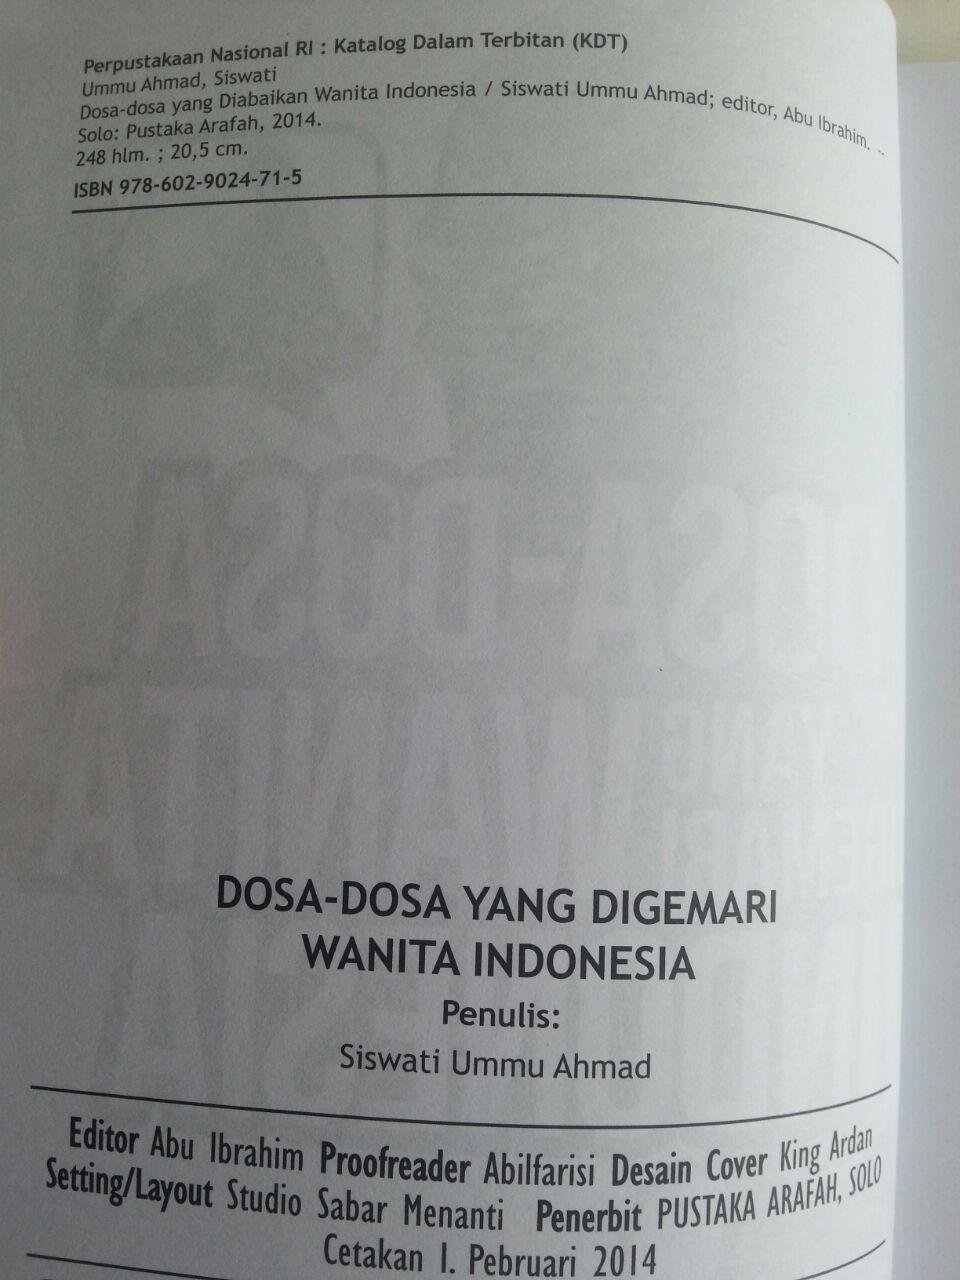 Buku Dosa-Dosa Yang Digemari Wanita Indonesia isi